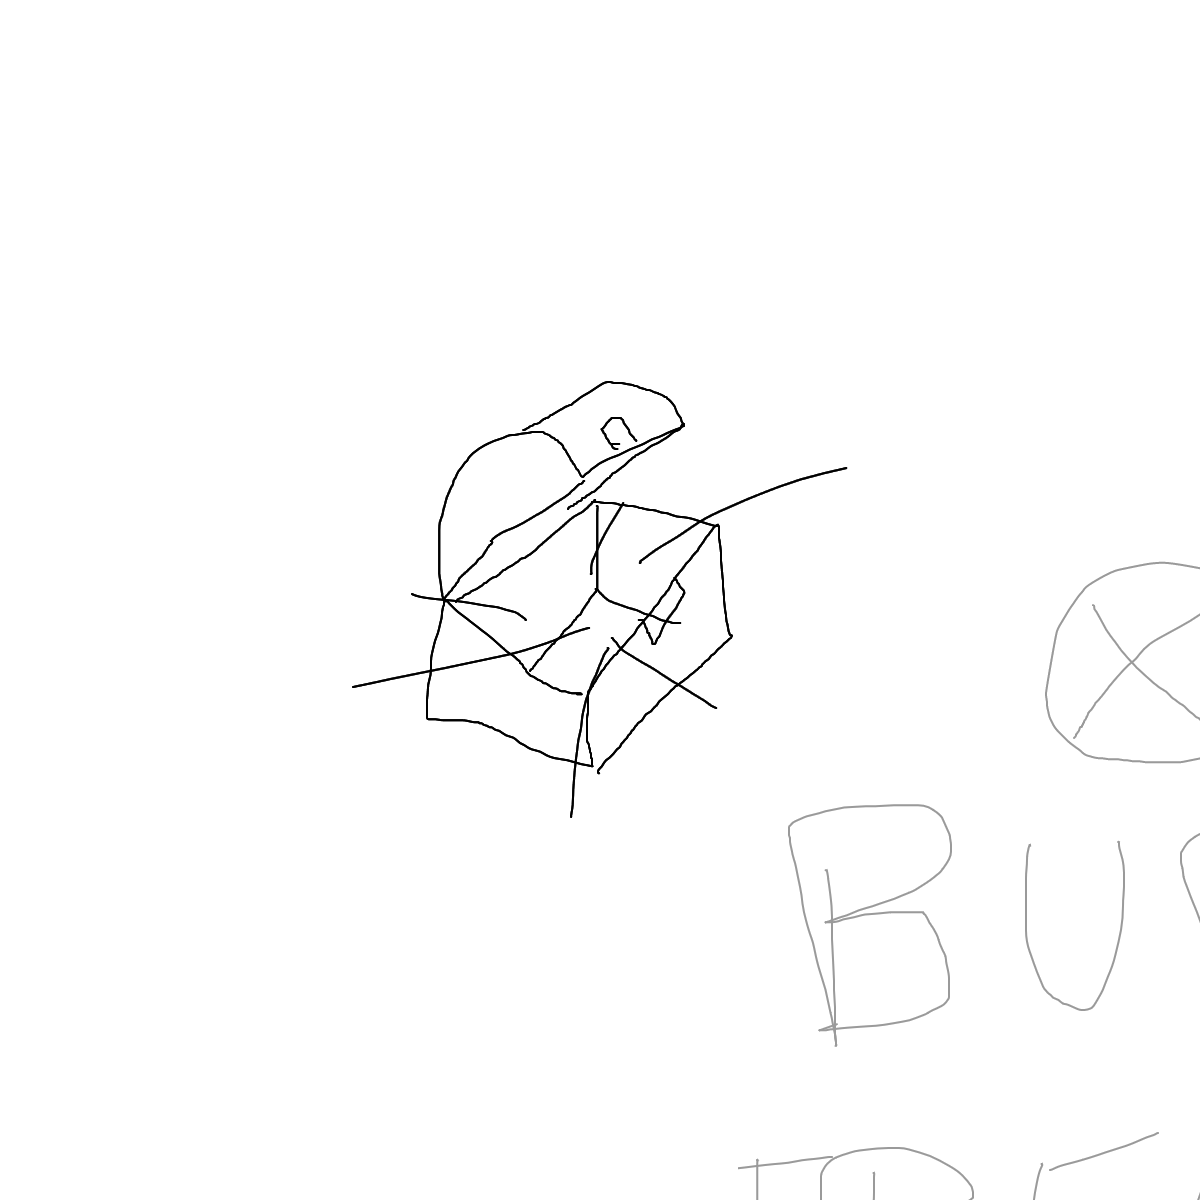 BAAAM drawing#218 lat:39.1625213623046900lng: -84.4103698730468800